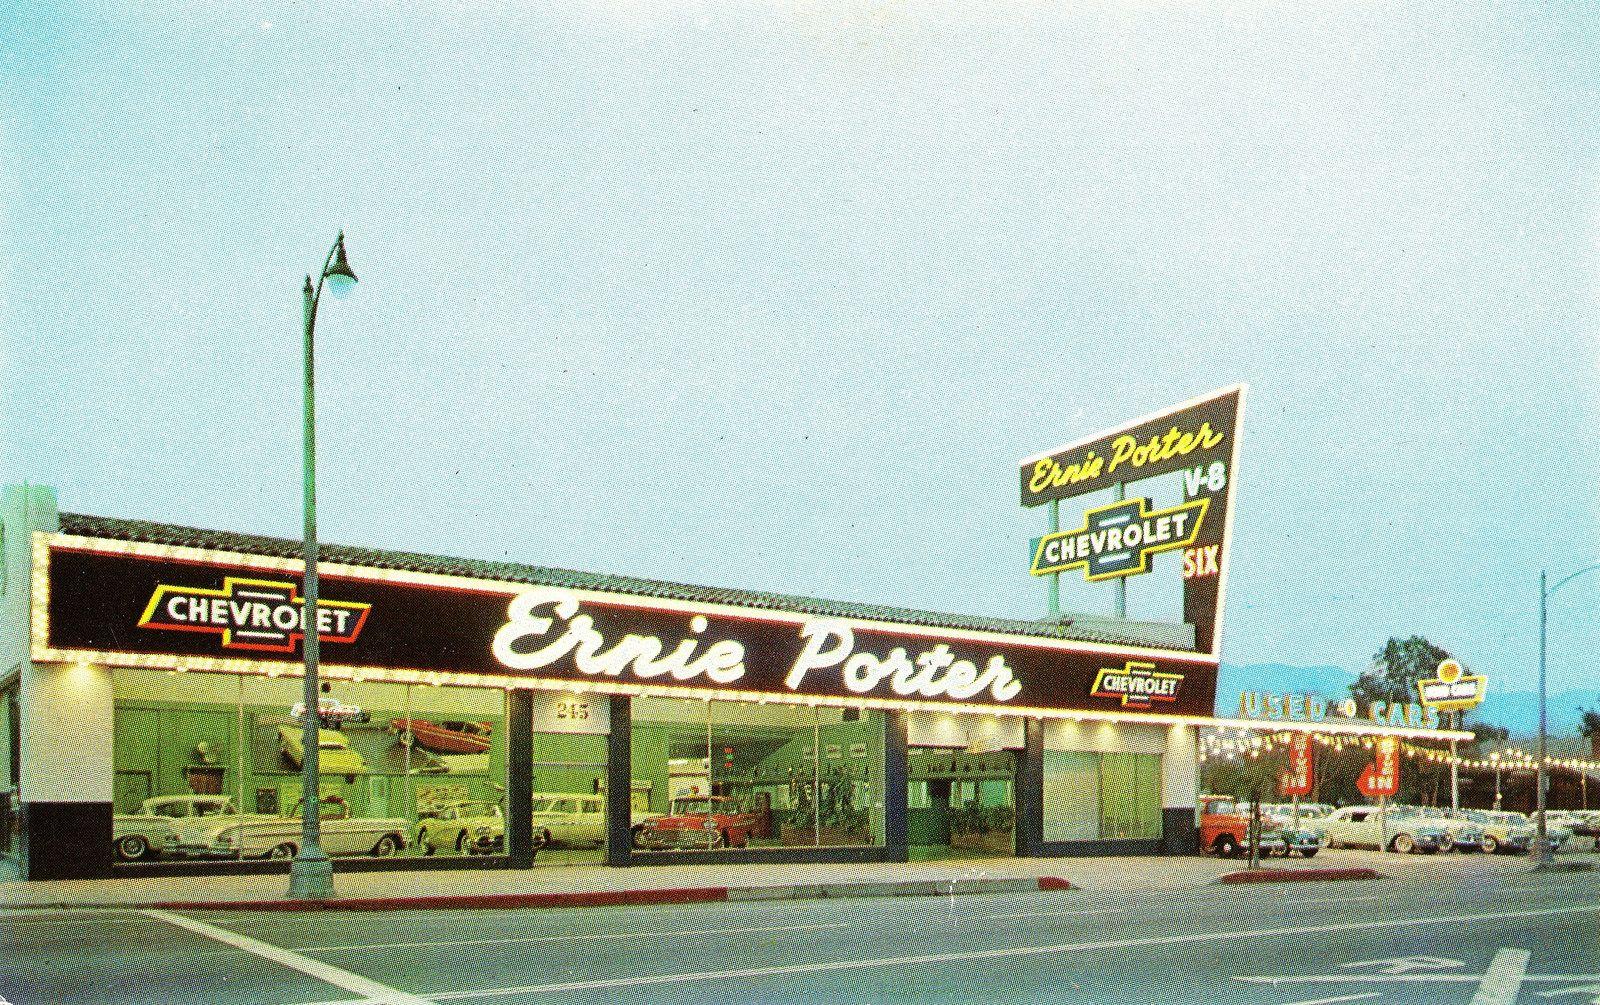 Ernie Porter Chevrolet Pasadena Ca 1958 Dealership Showroom Chevrolet Dealership Car Memorabilia